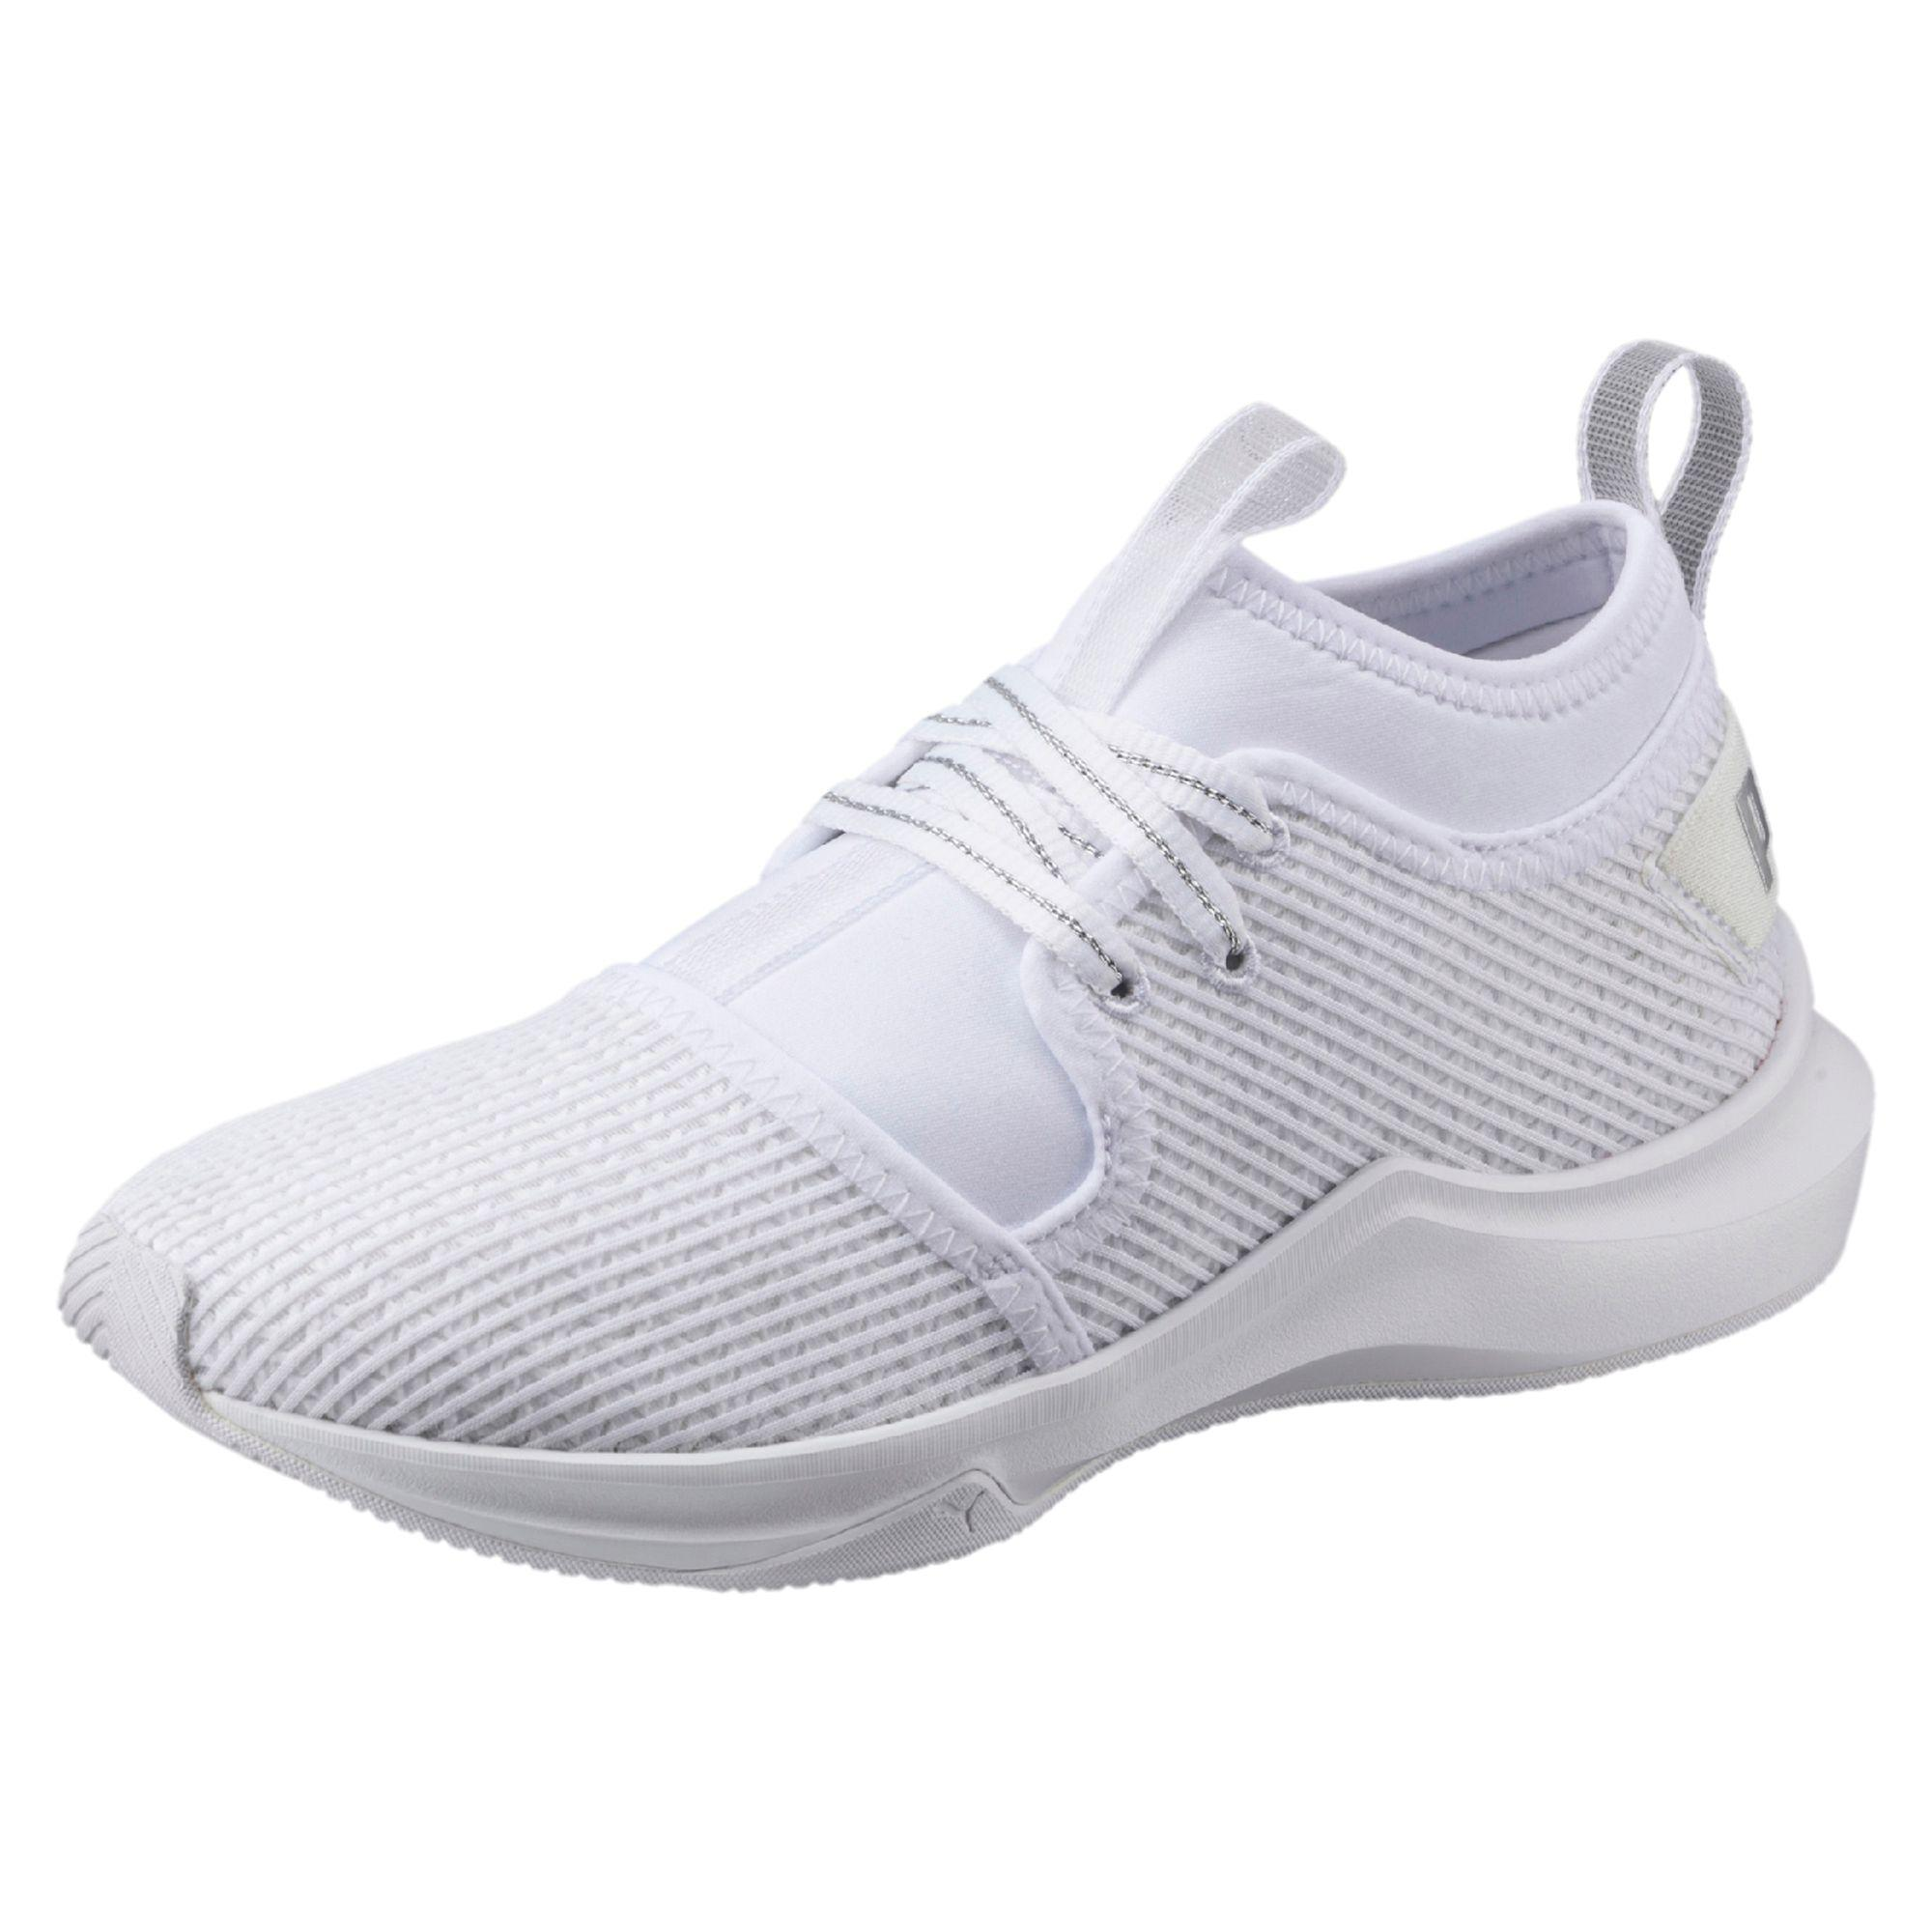 b236654252d6 Lyst - PUMA Phenom Low En Pointe Women s Running Shoes in White